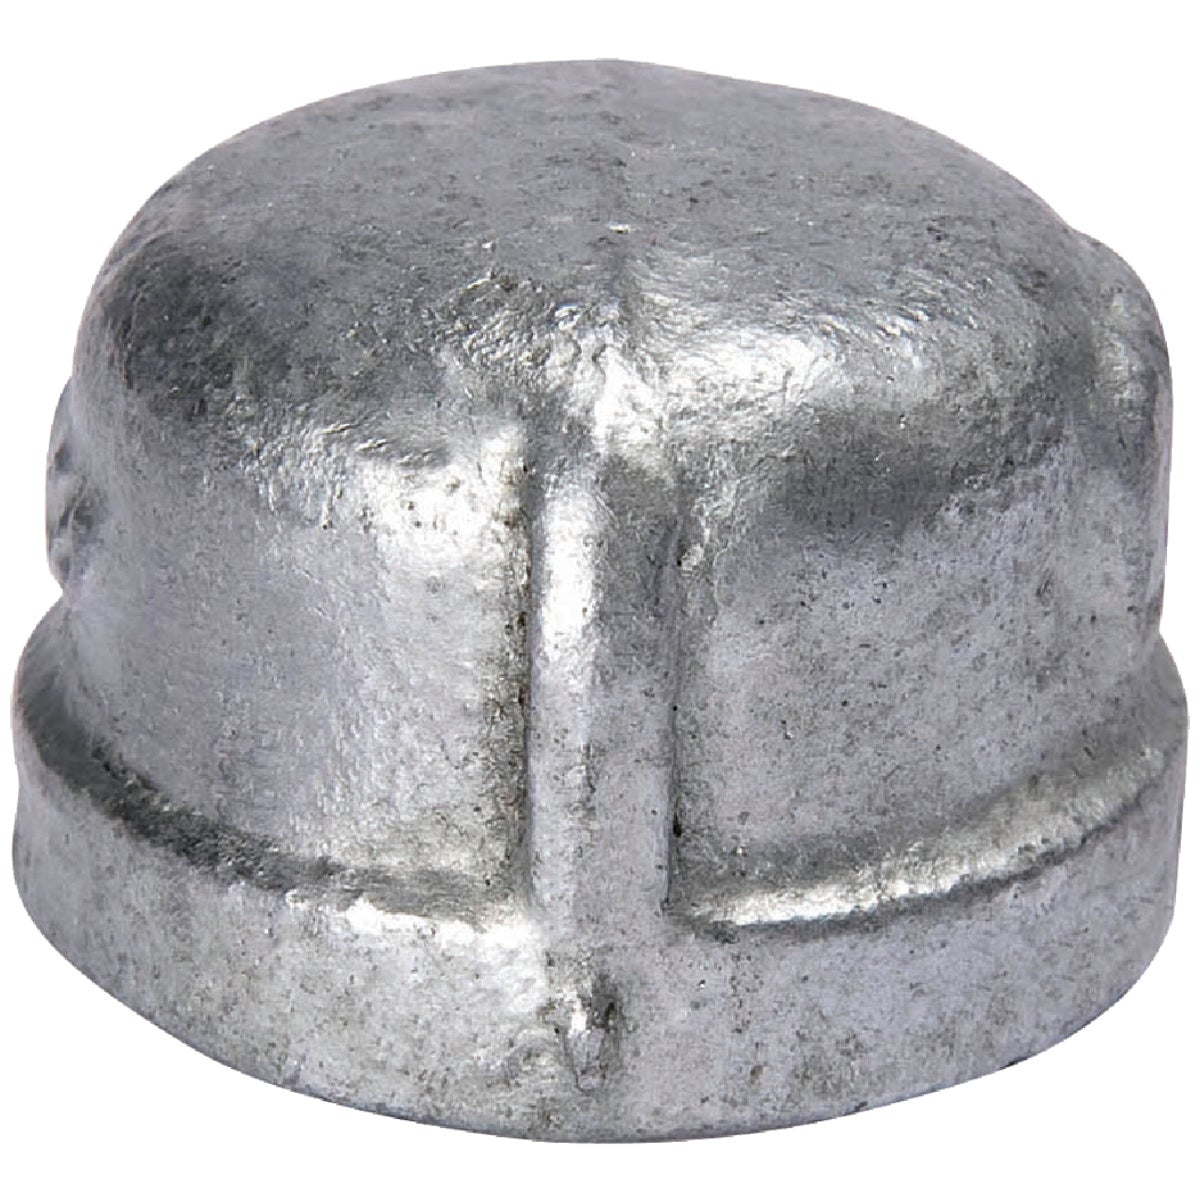 B & K 511-408bg Caps Galv 2